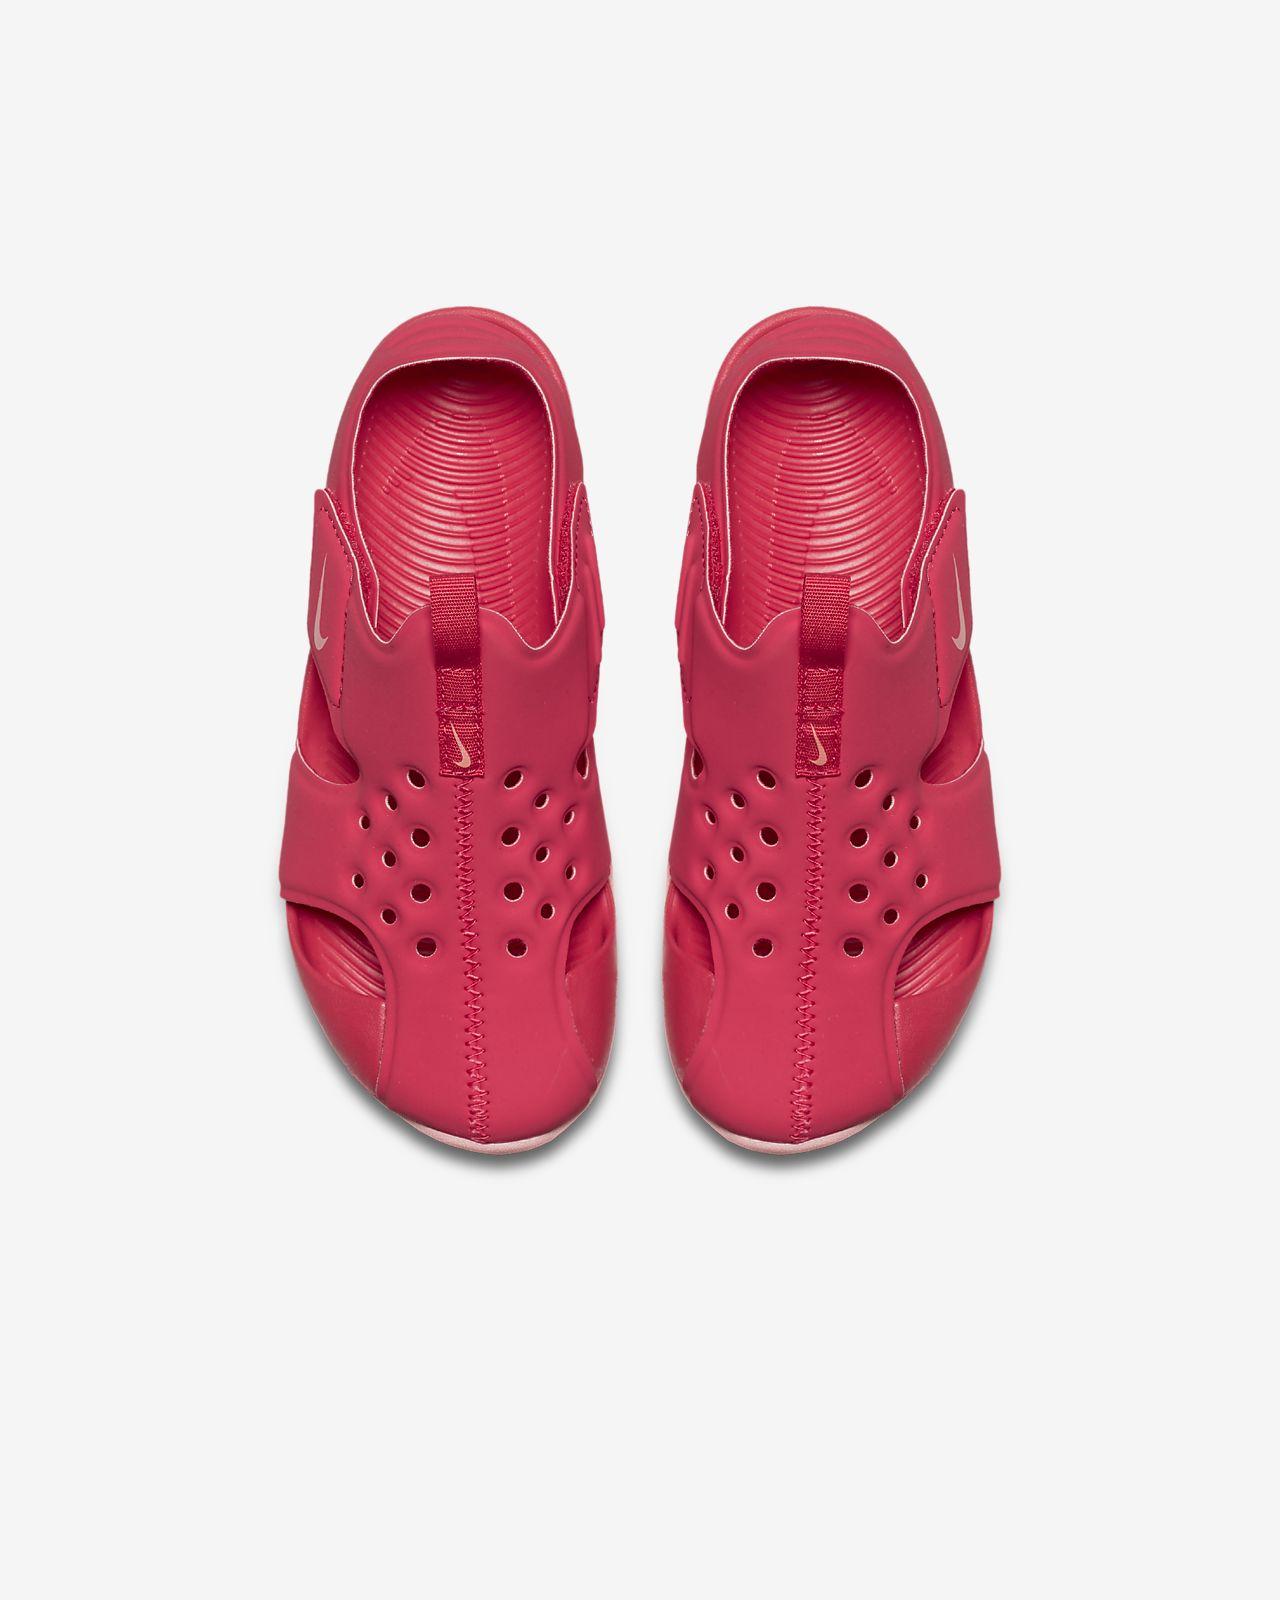 06932f024f2e96 Nike Sunray Protect 2 Younger Kids  Sandal. Nike.com ZA